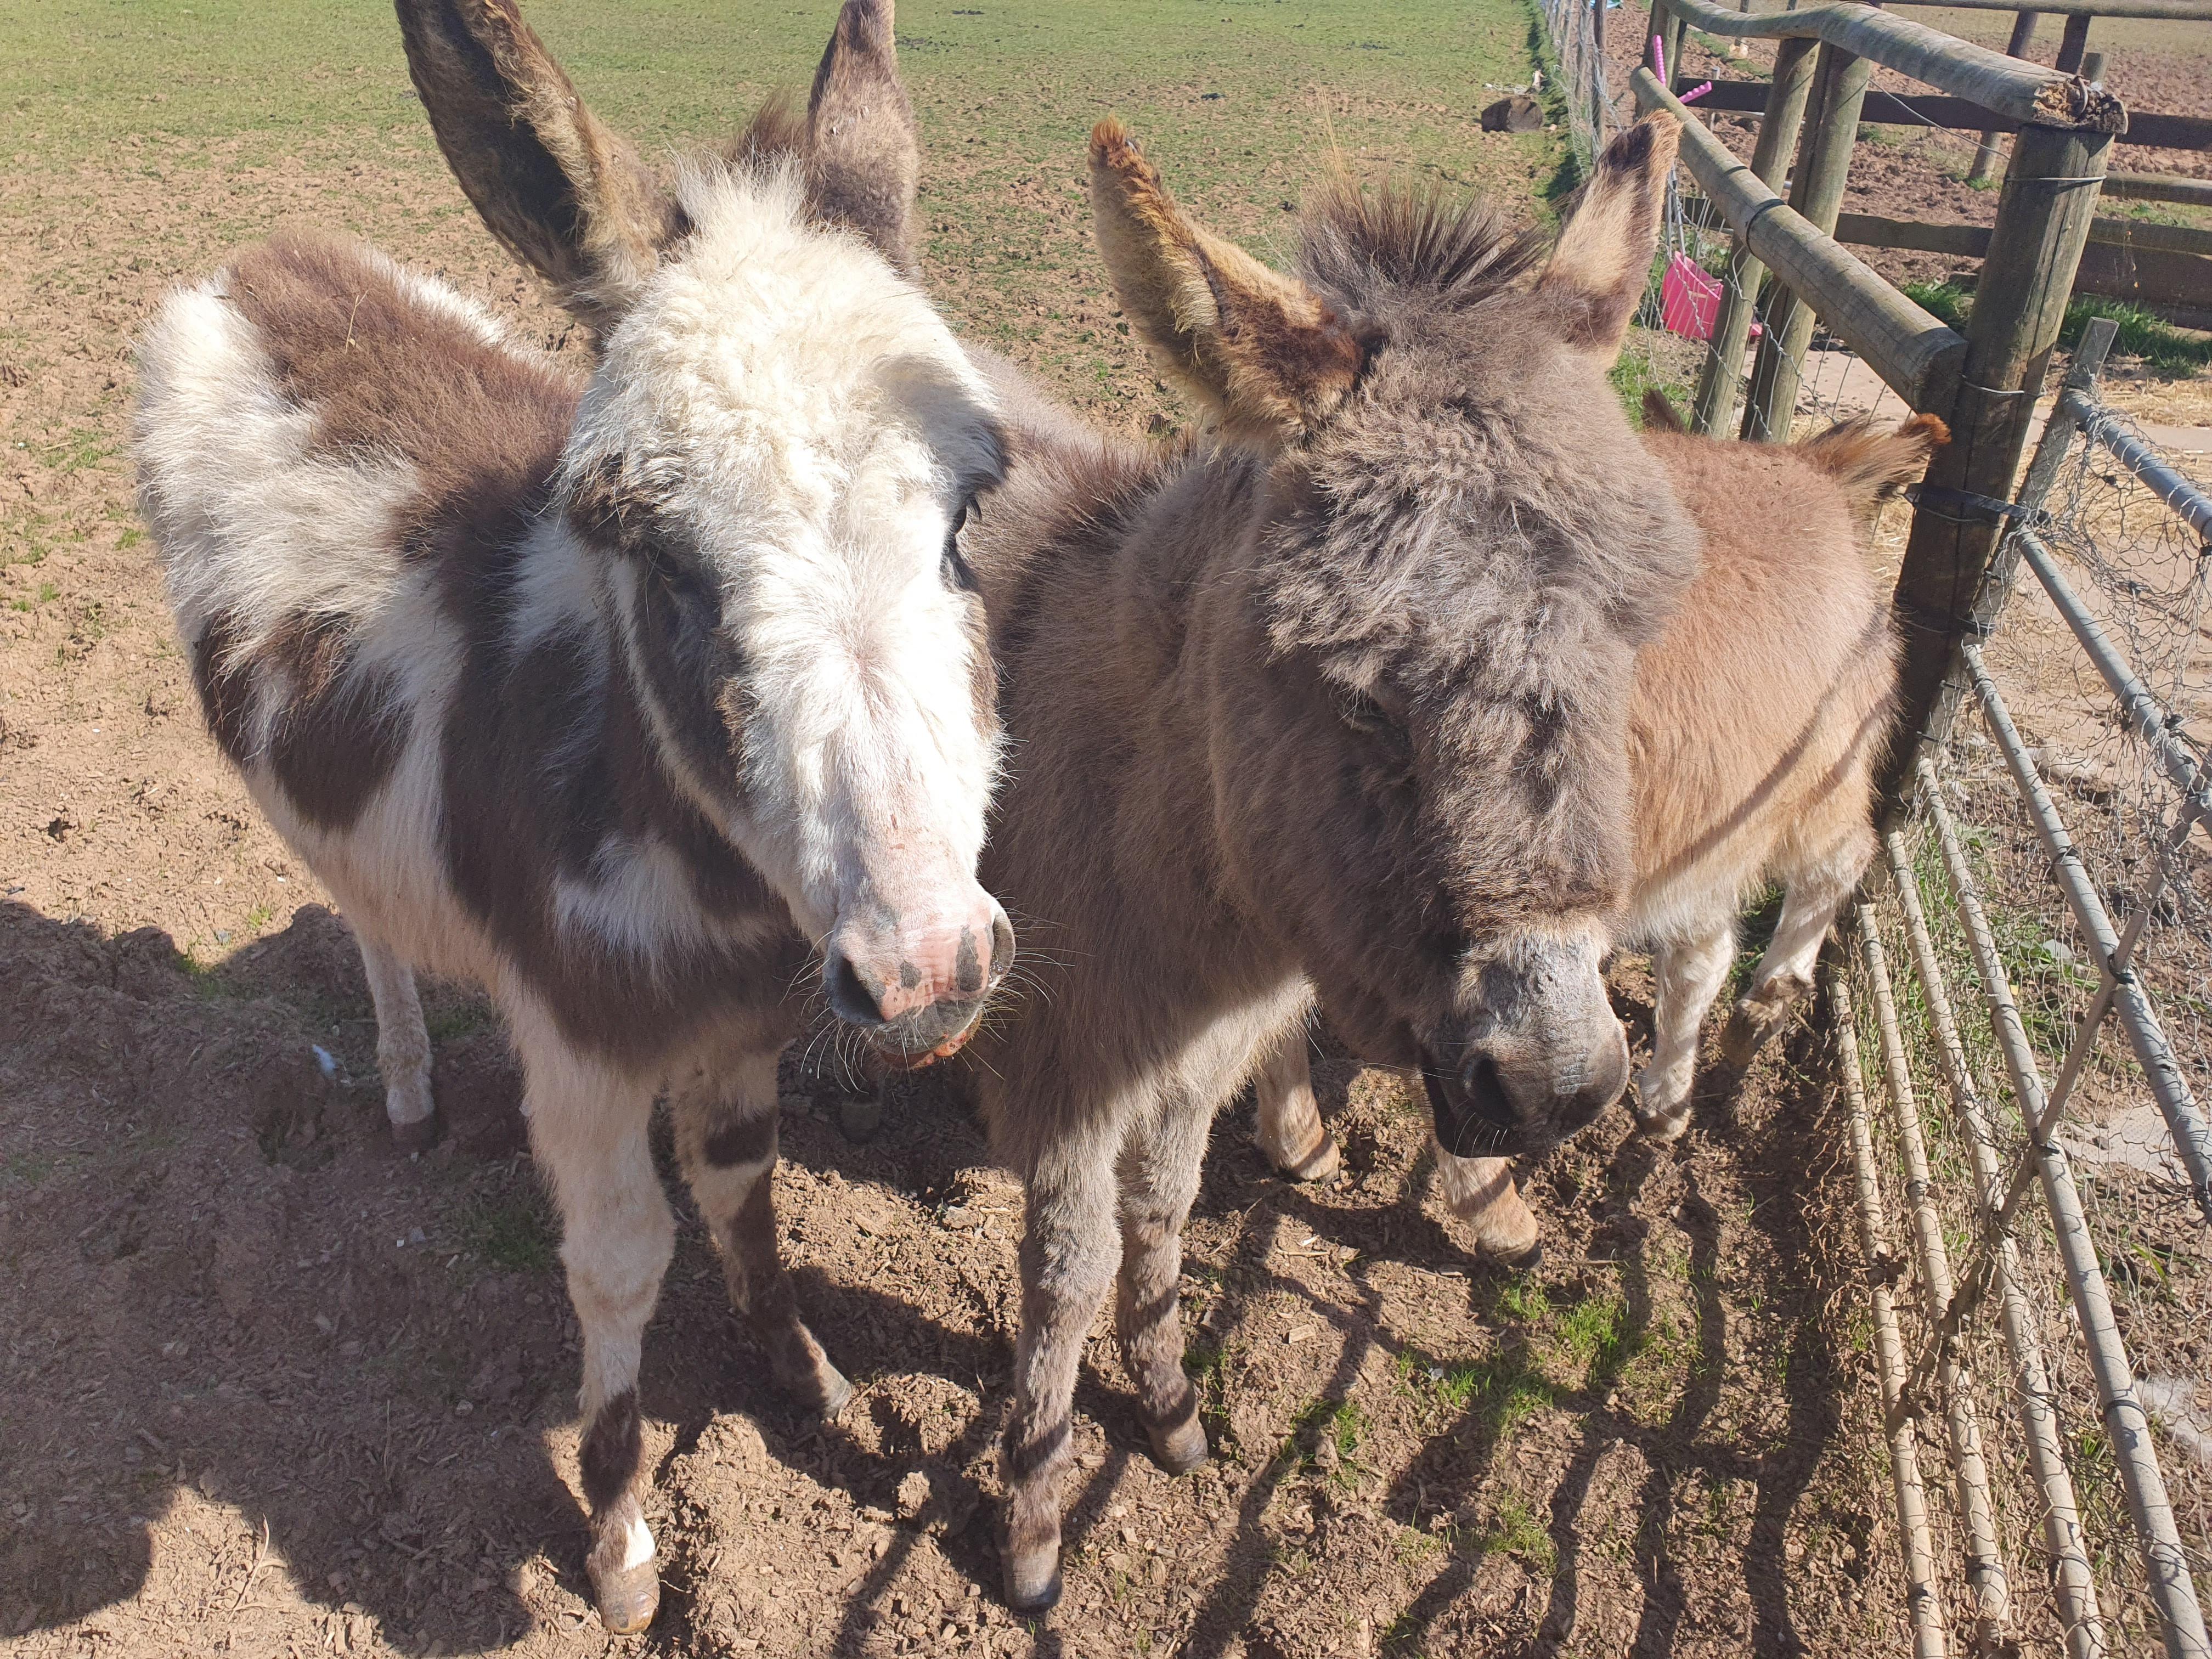 Donkey Expirience